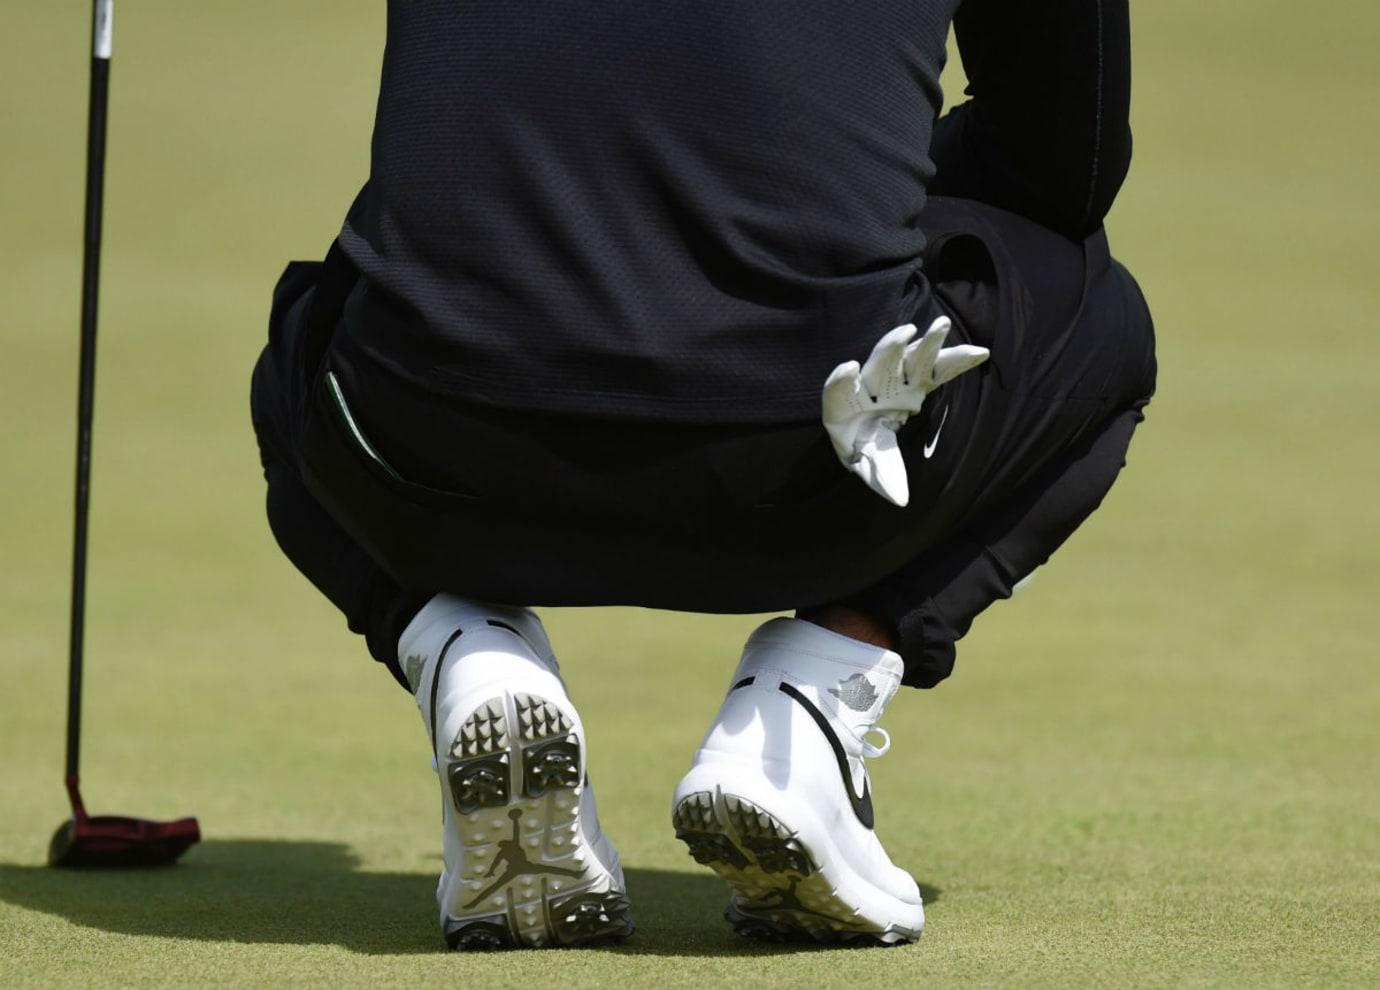 Jason Day Air Jordan 1 Golf Shoes (4)